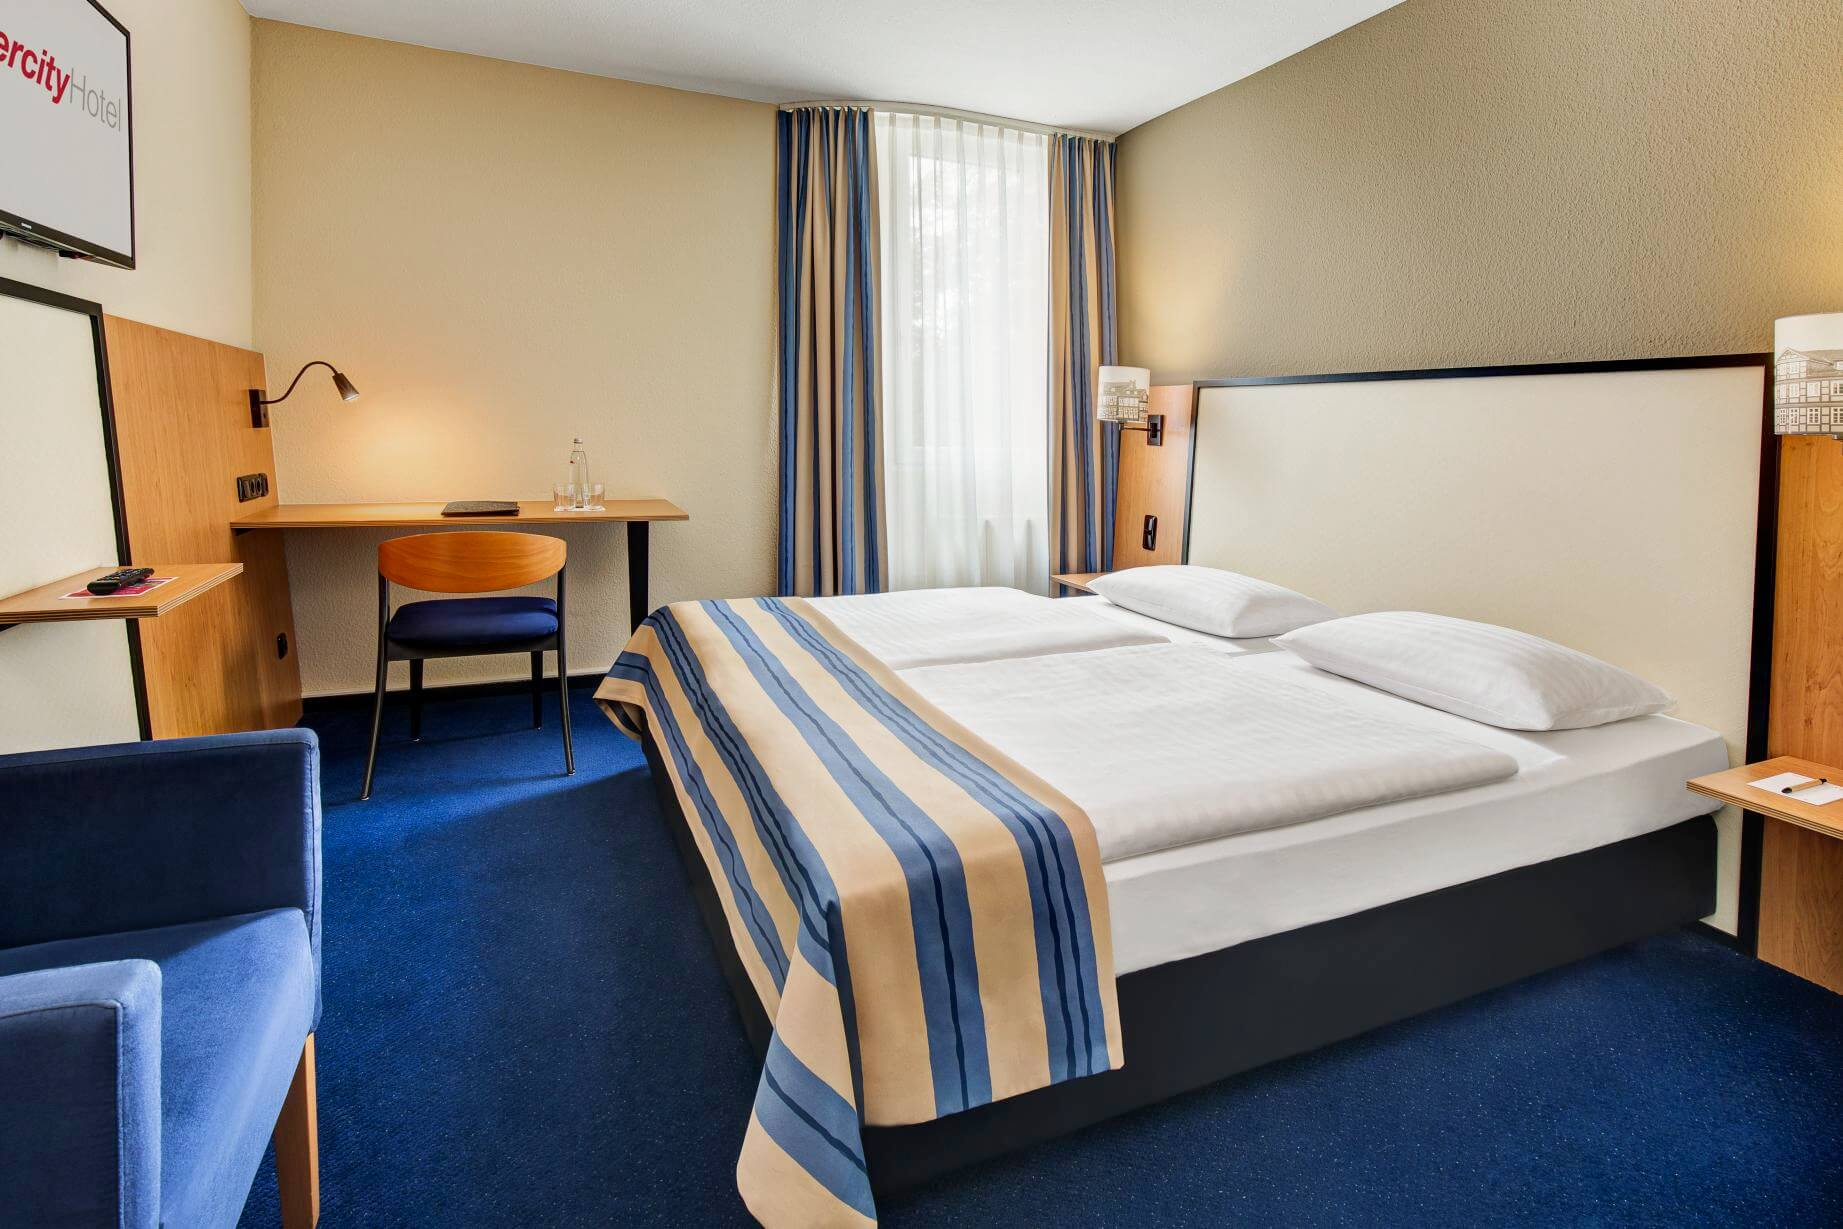 Intercity Hotel Celle, Doppelzimmer